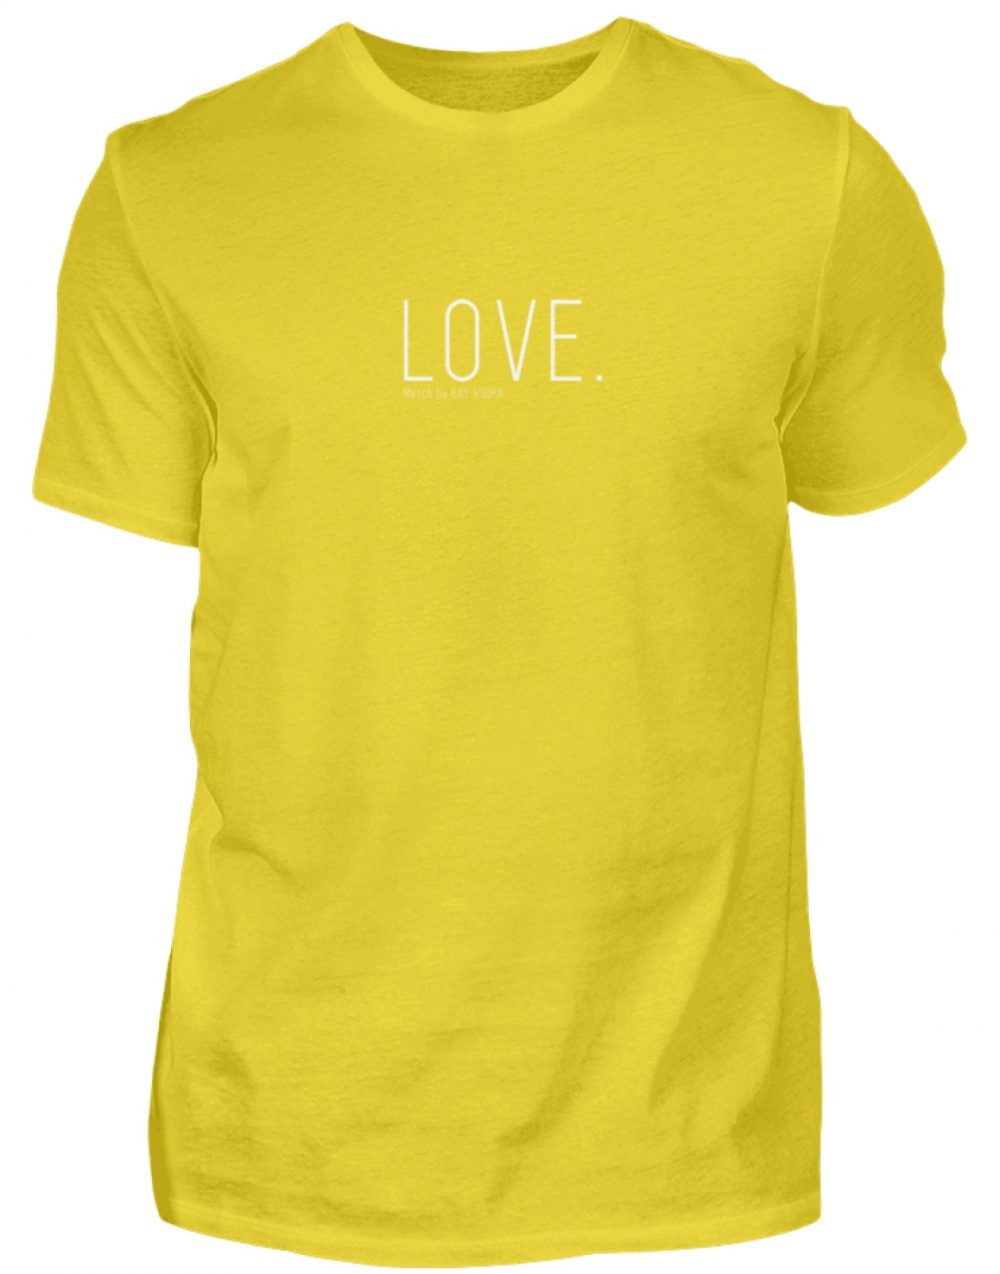 LOVE. - Herren Shirt-1102